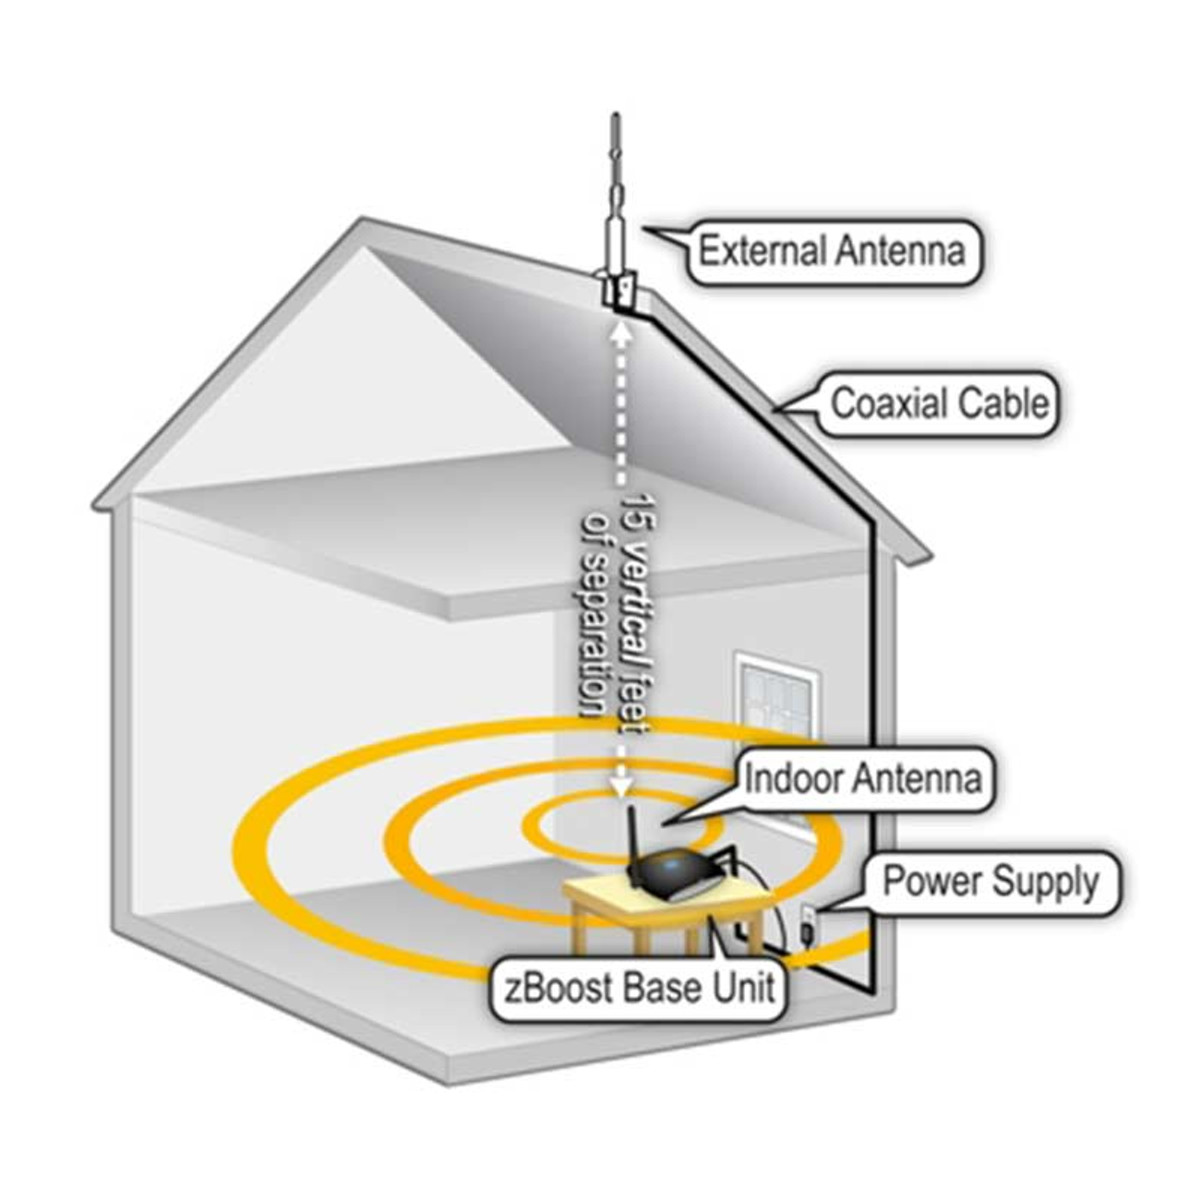 zBoost Trio Soho Verizon Cell Phone Signal Booster | ZB575-V Diagram